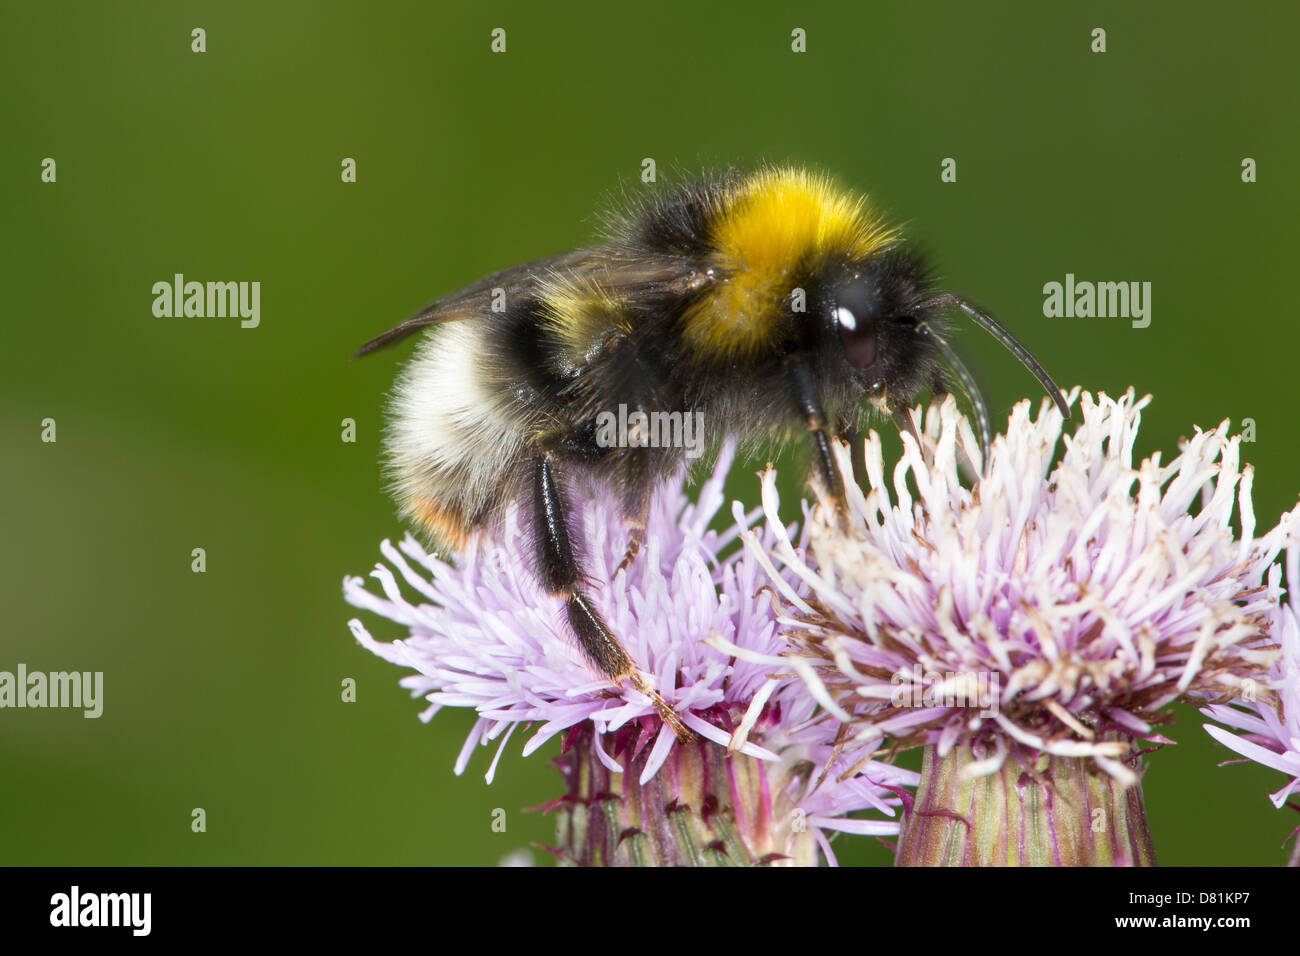 Male Forest Cuckoo Bumblebee, Bombus sylvestris, feeding Creeping Thistle Cirsium arvense - Stock Image